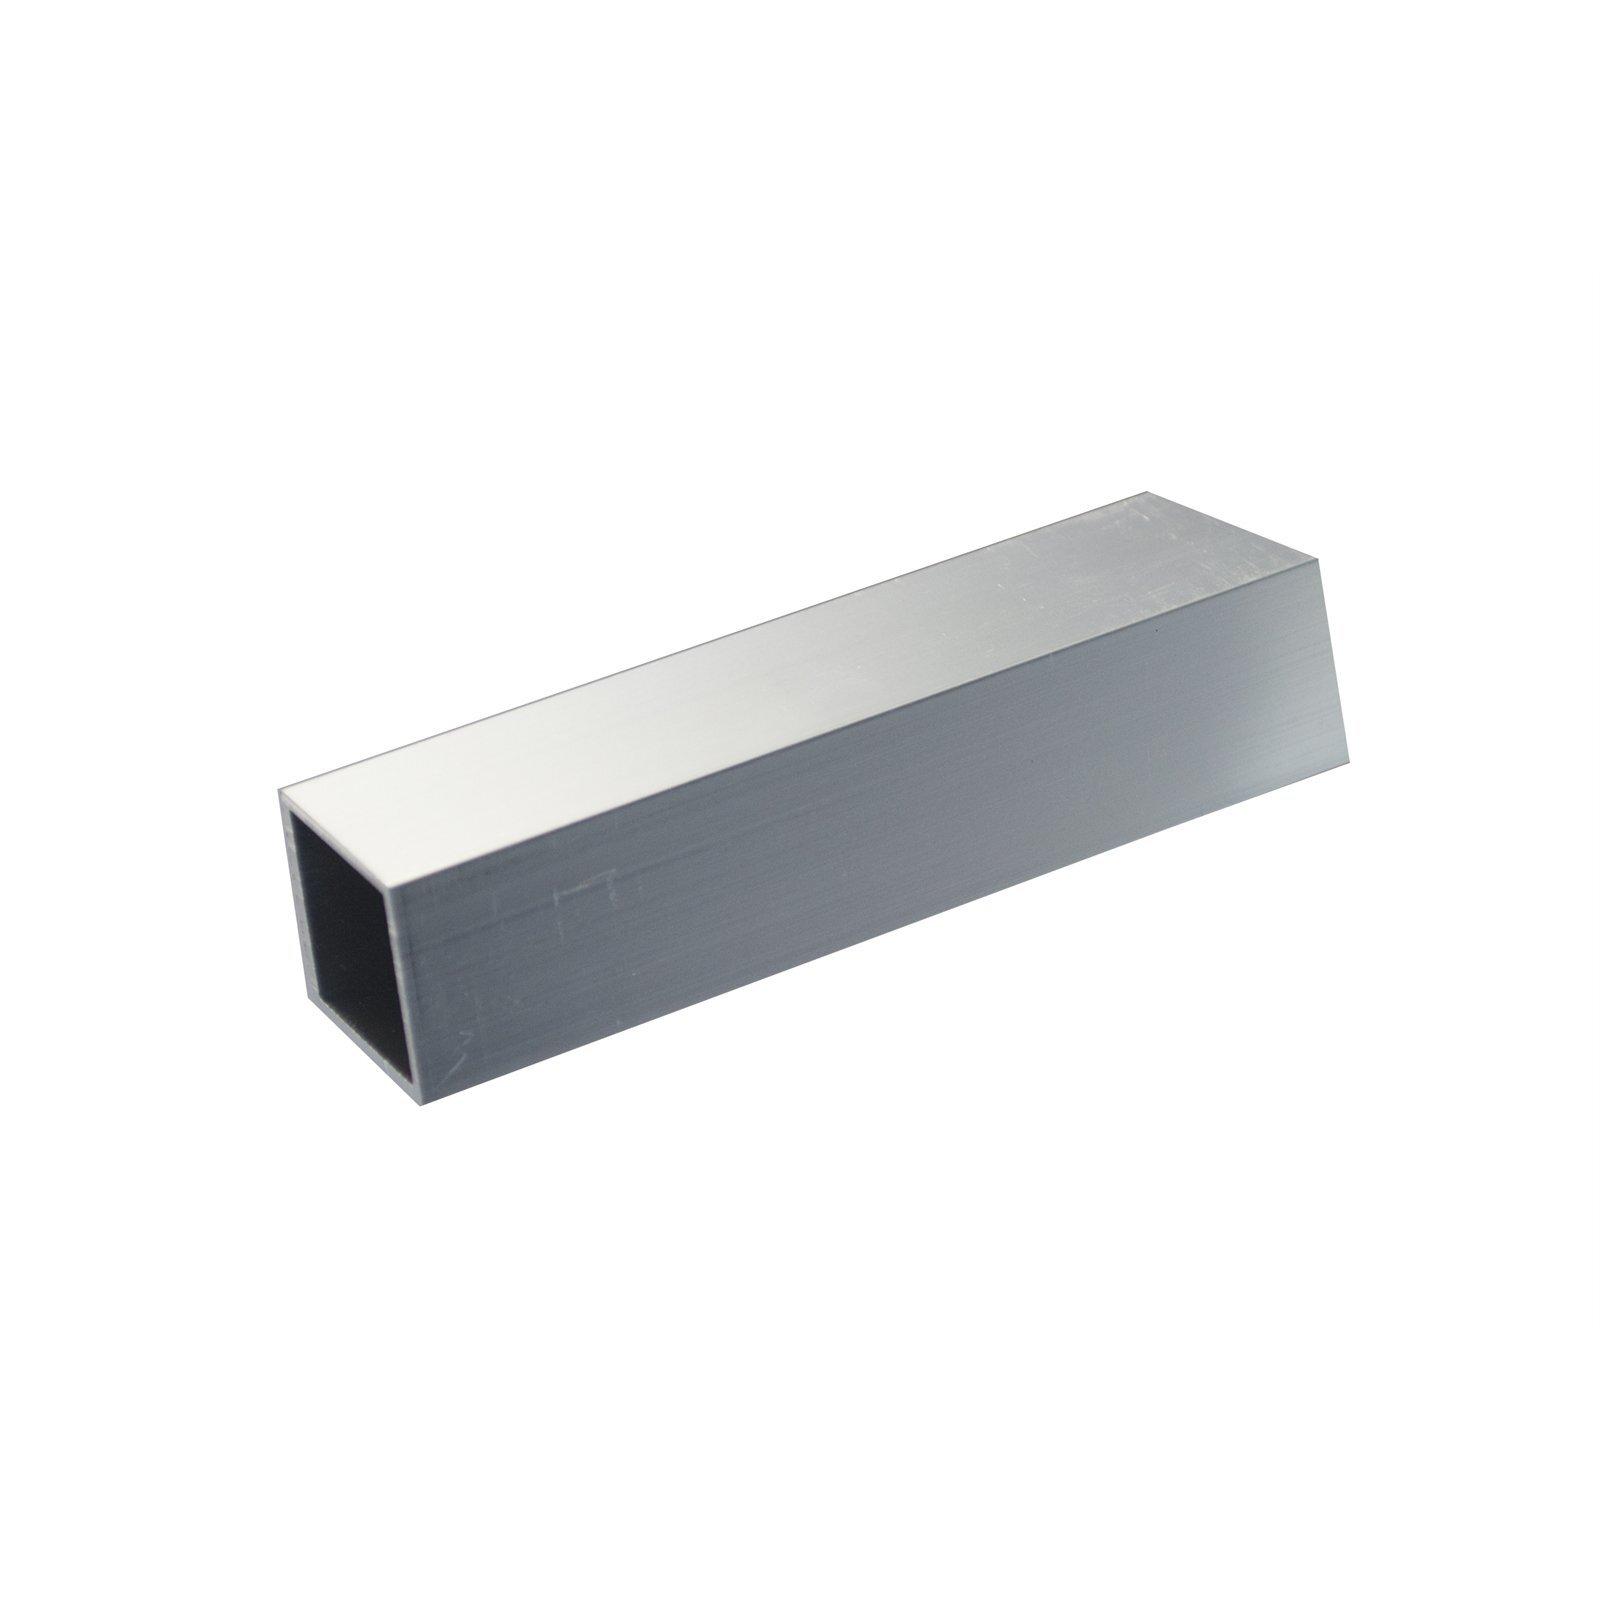 Metal Mate 25.4 x 25.4 x 1.2mm 3m Aluminium Square Box Tube